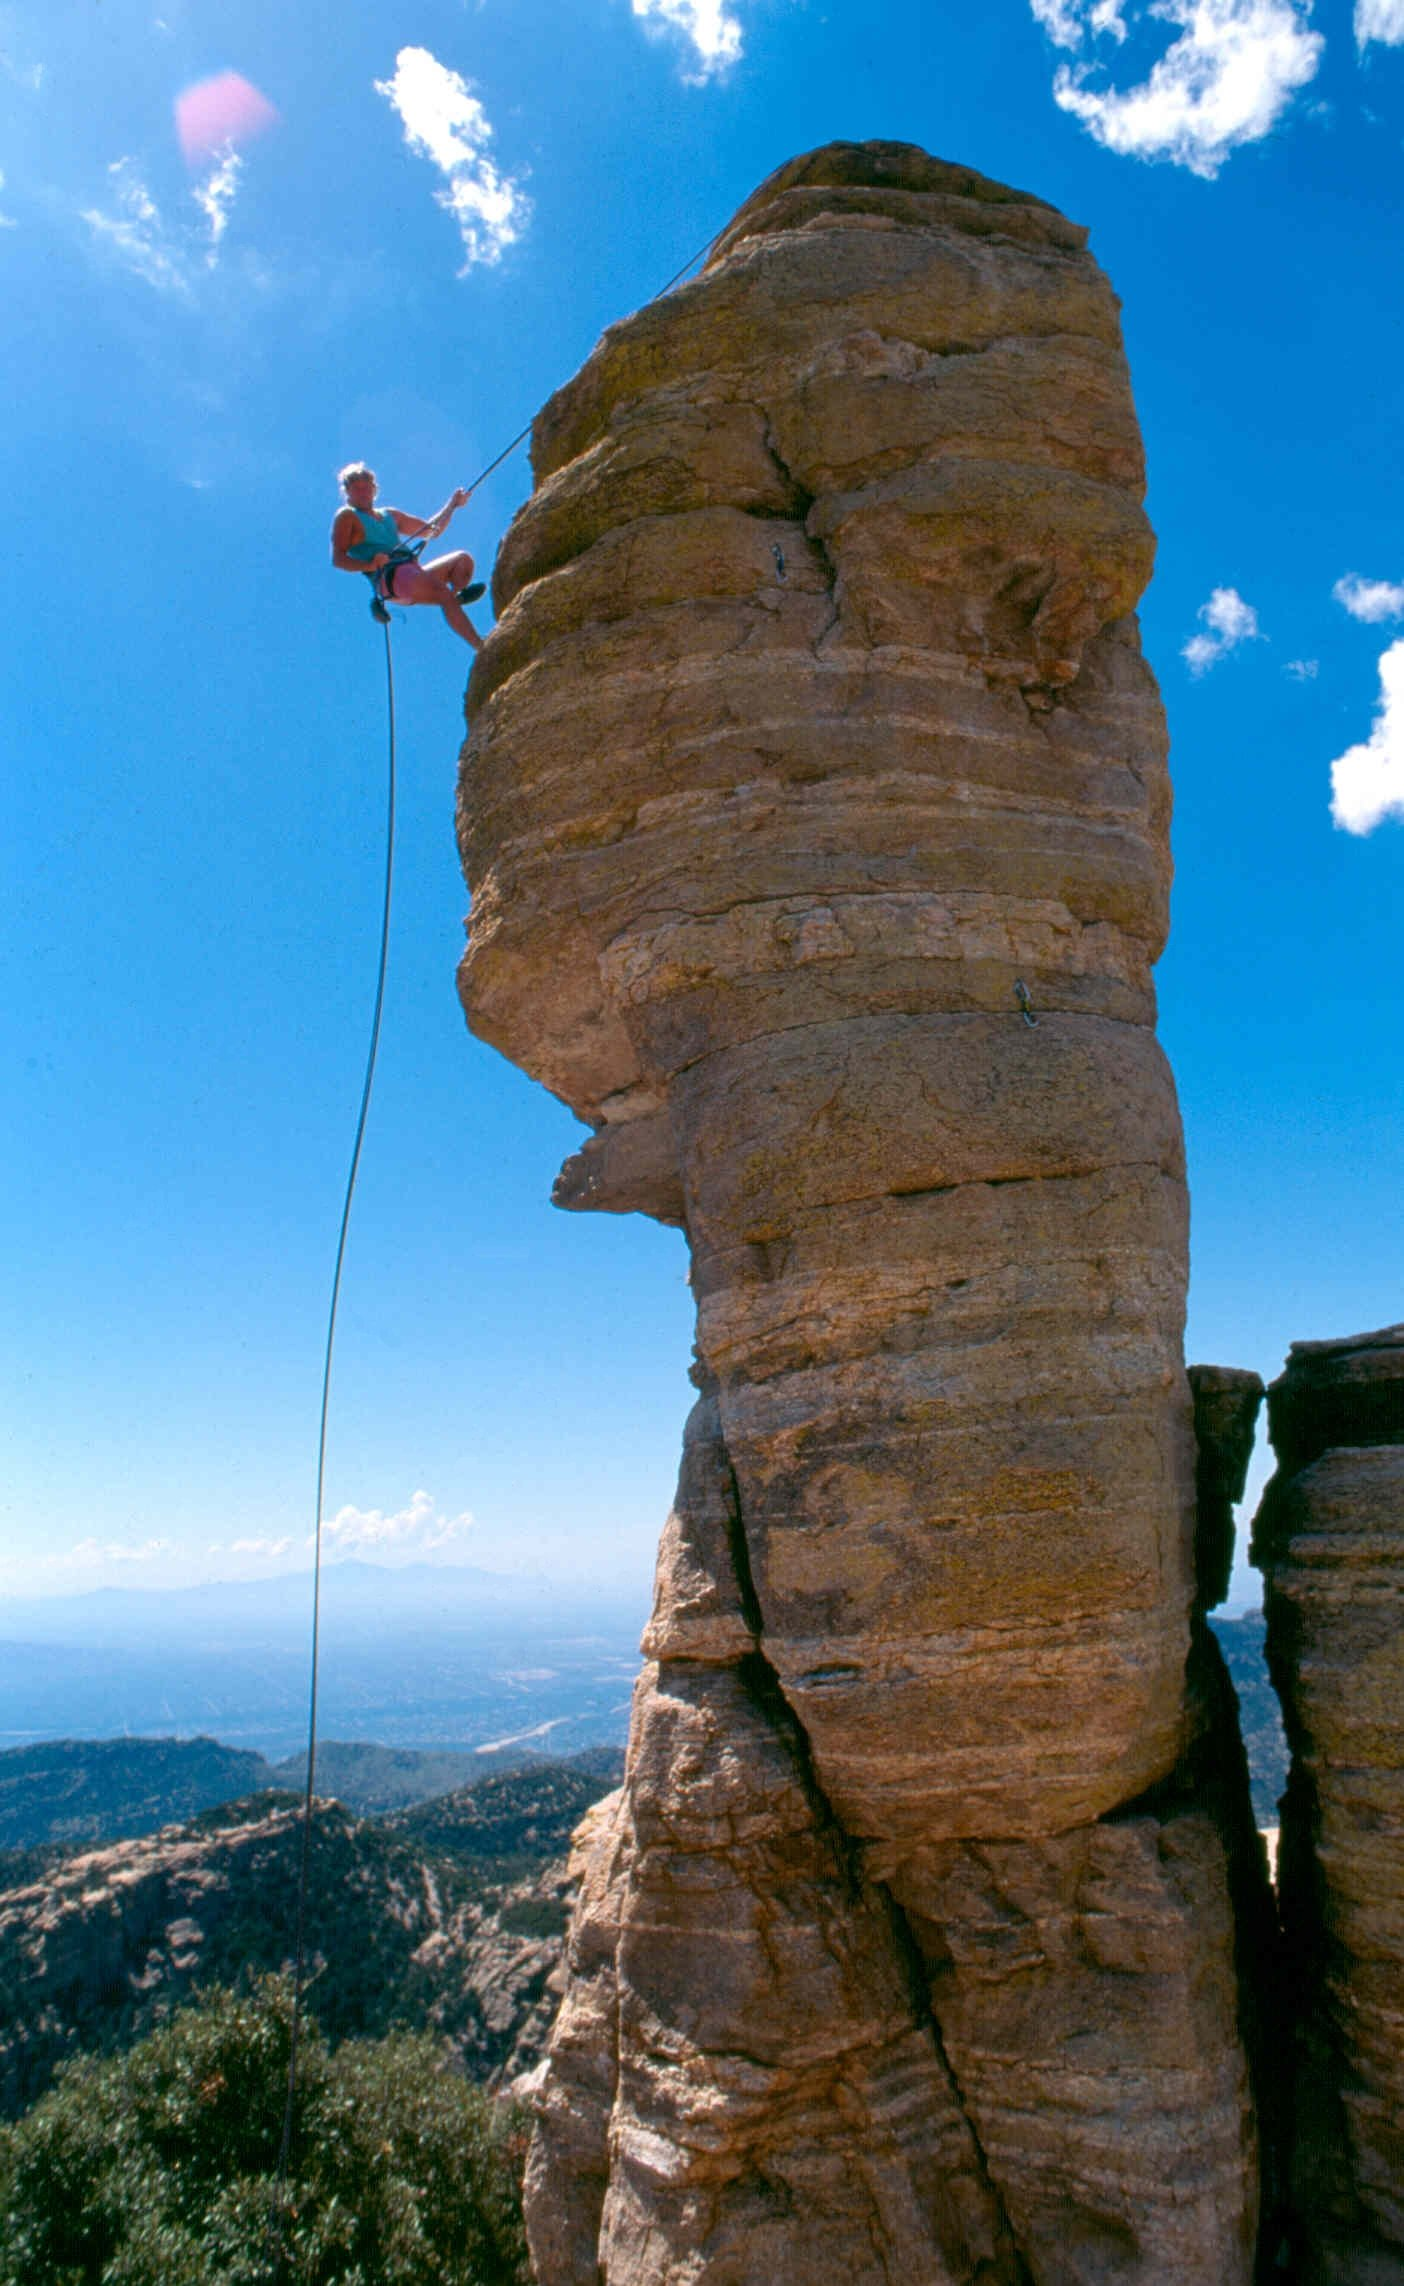 http://upload.wikimedia.org/wikipedia/commons/a/a2/RockClimber_SkyIslandScenicByway.JPG